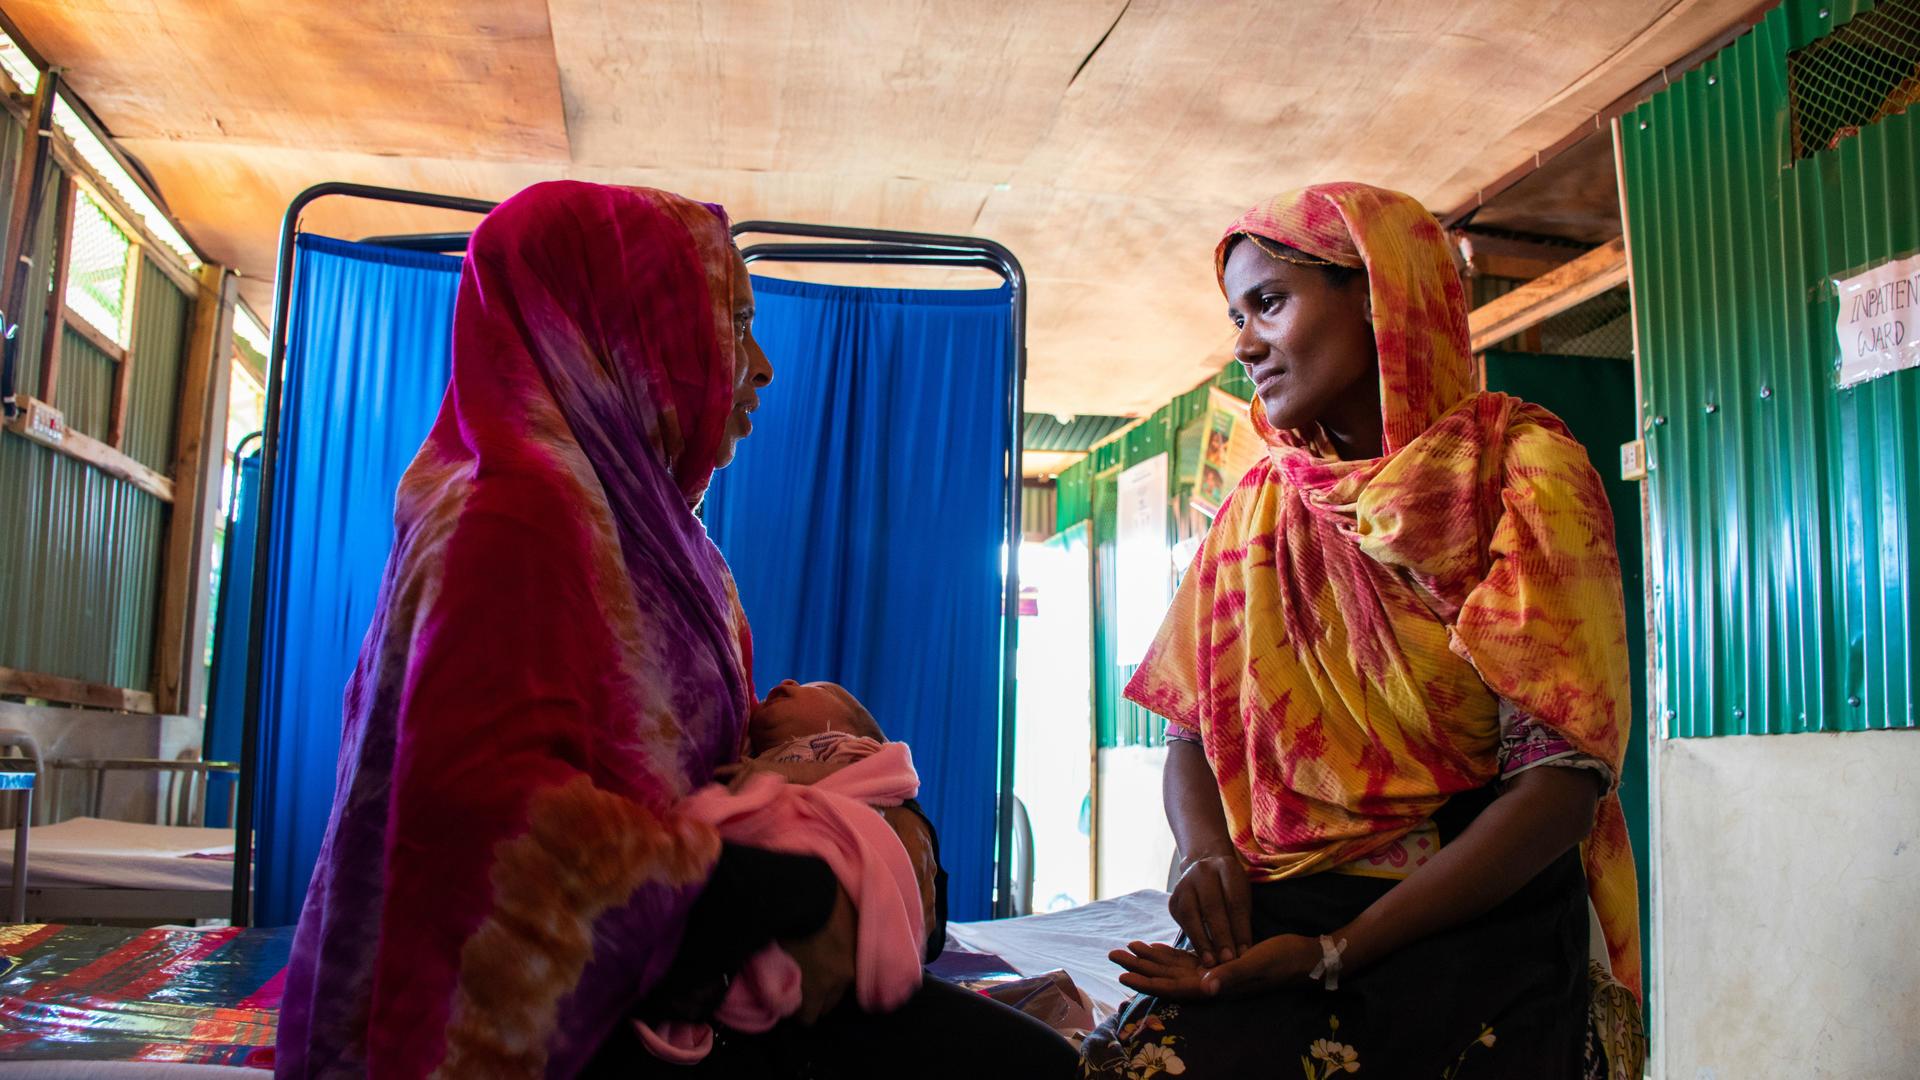 Fatima visits Shahera and her newborn at the women's health center in Kutupalong refugee camp.